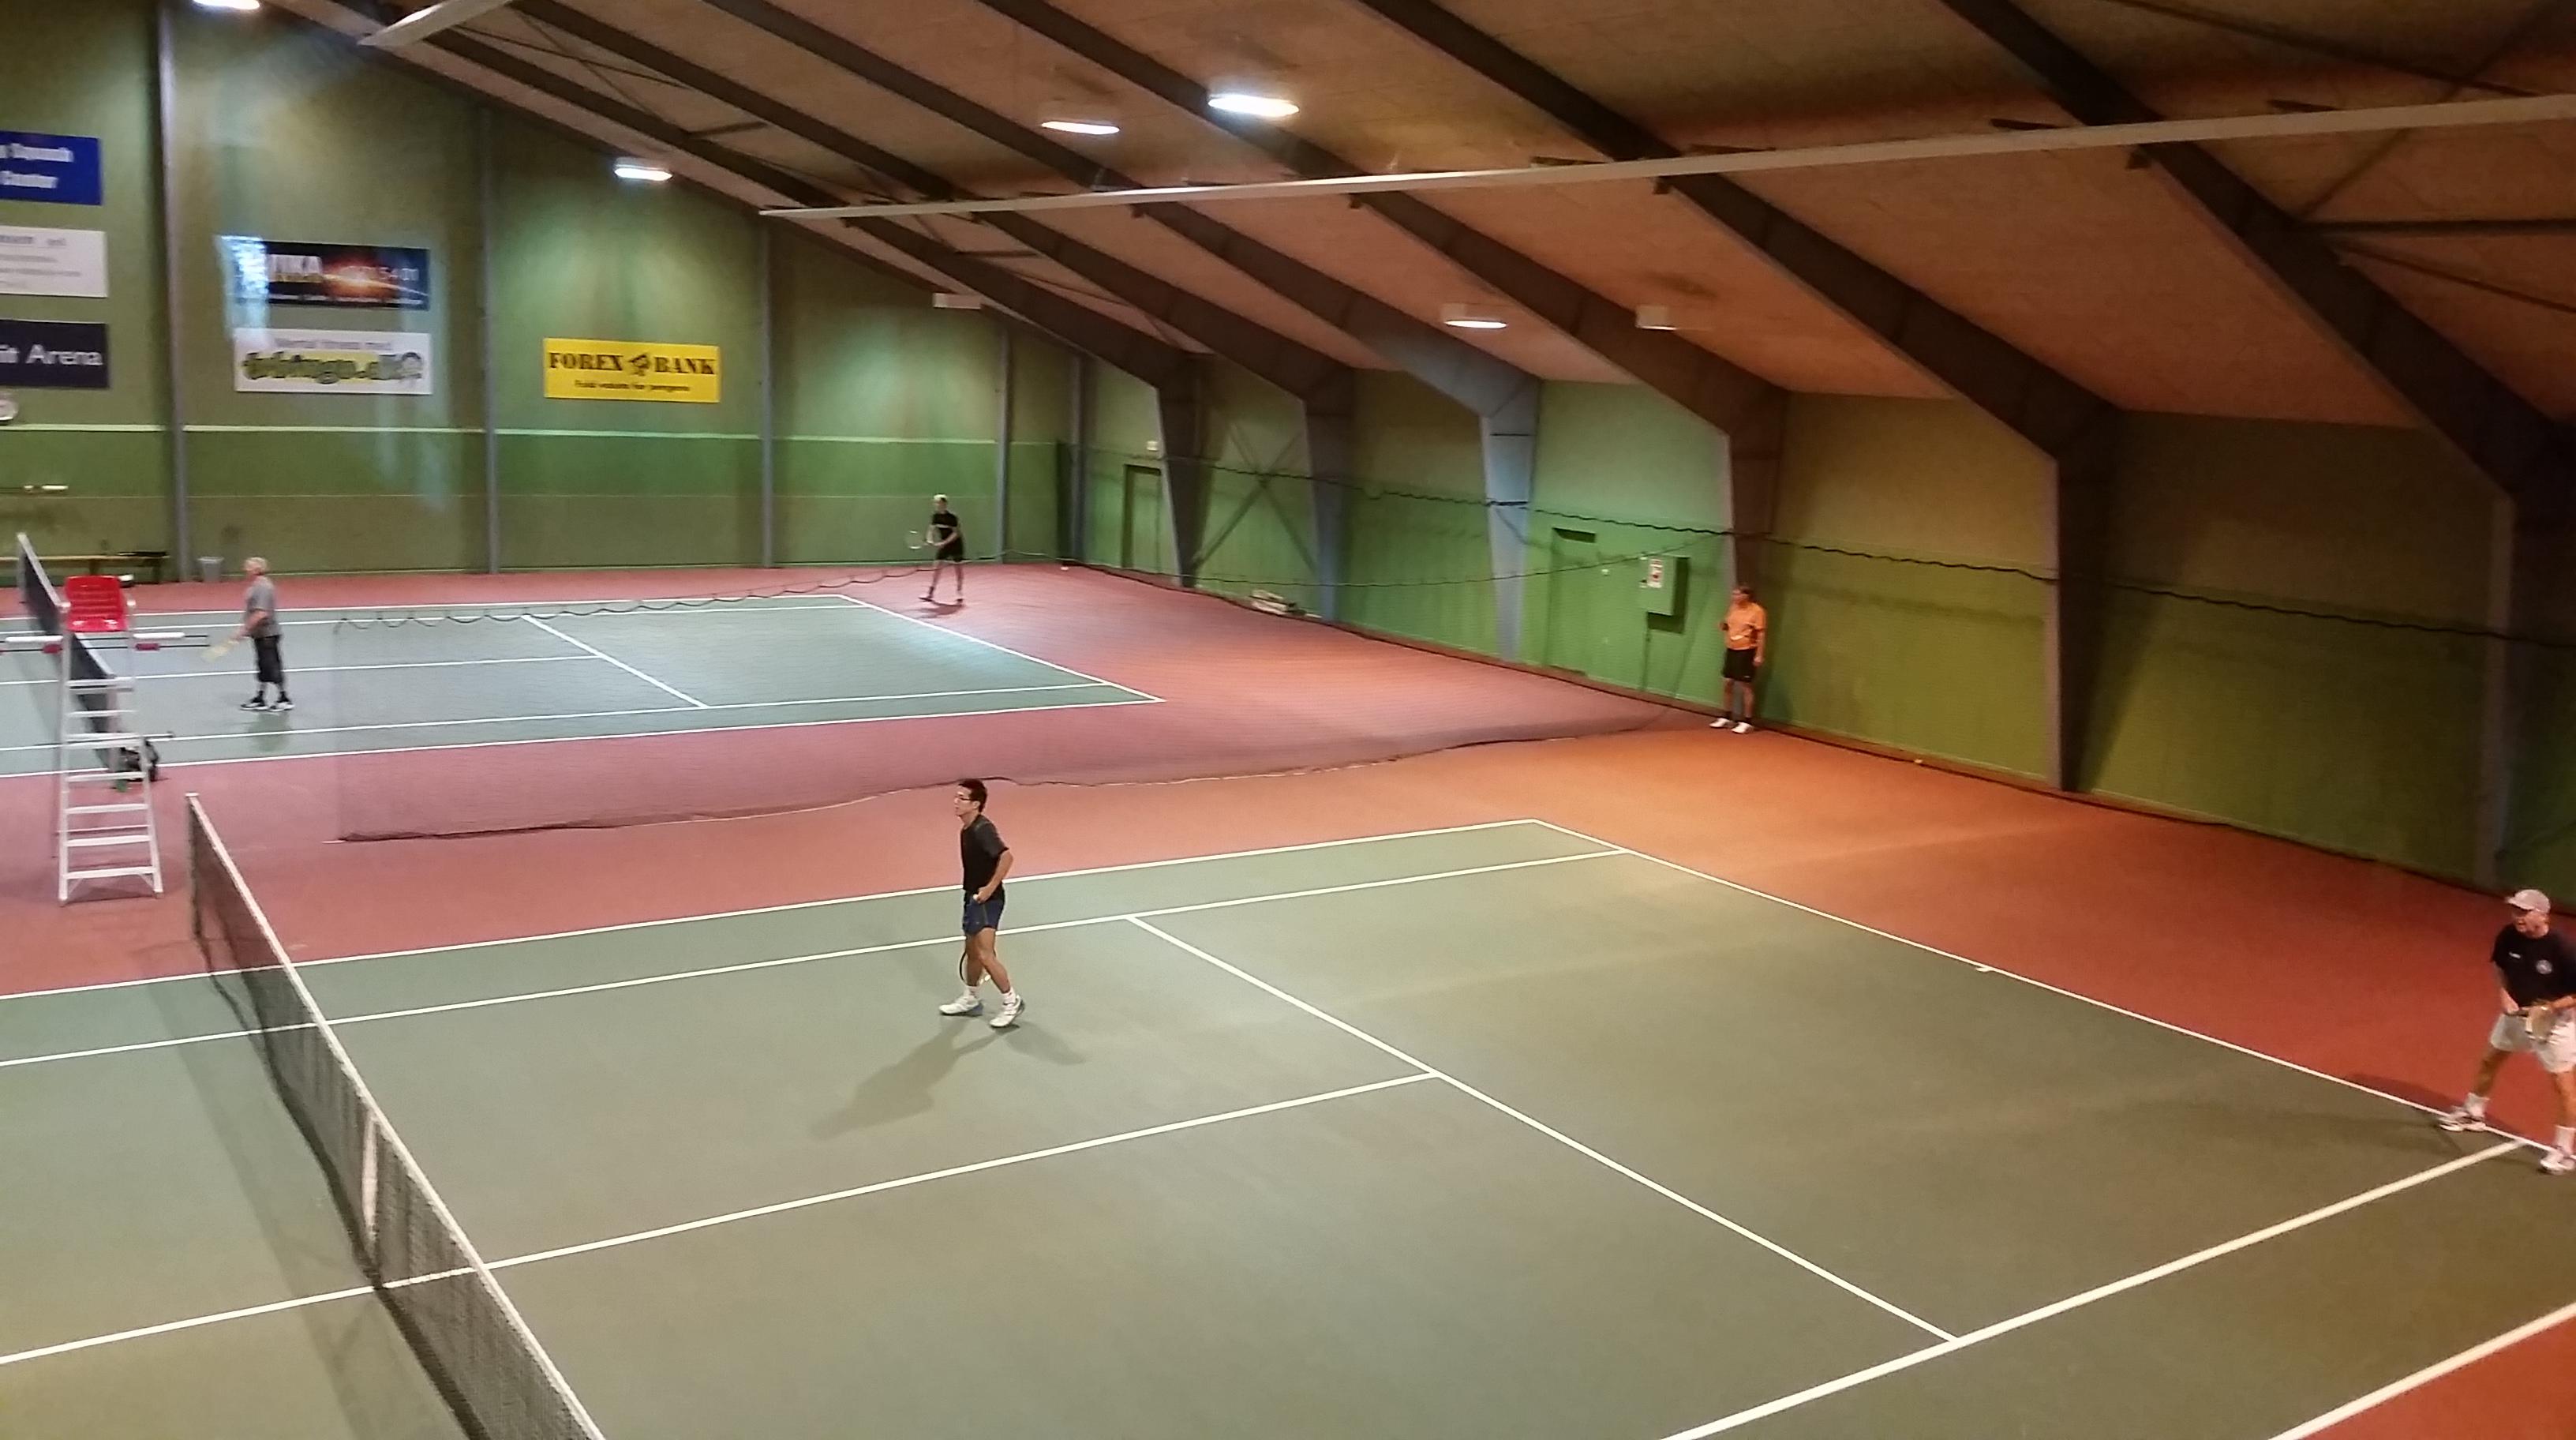 Tennishallen i Nørresundby.